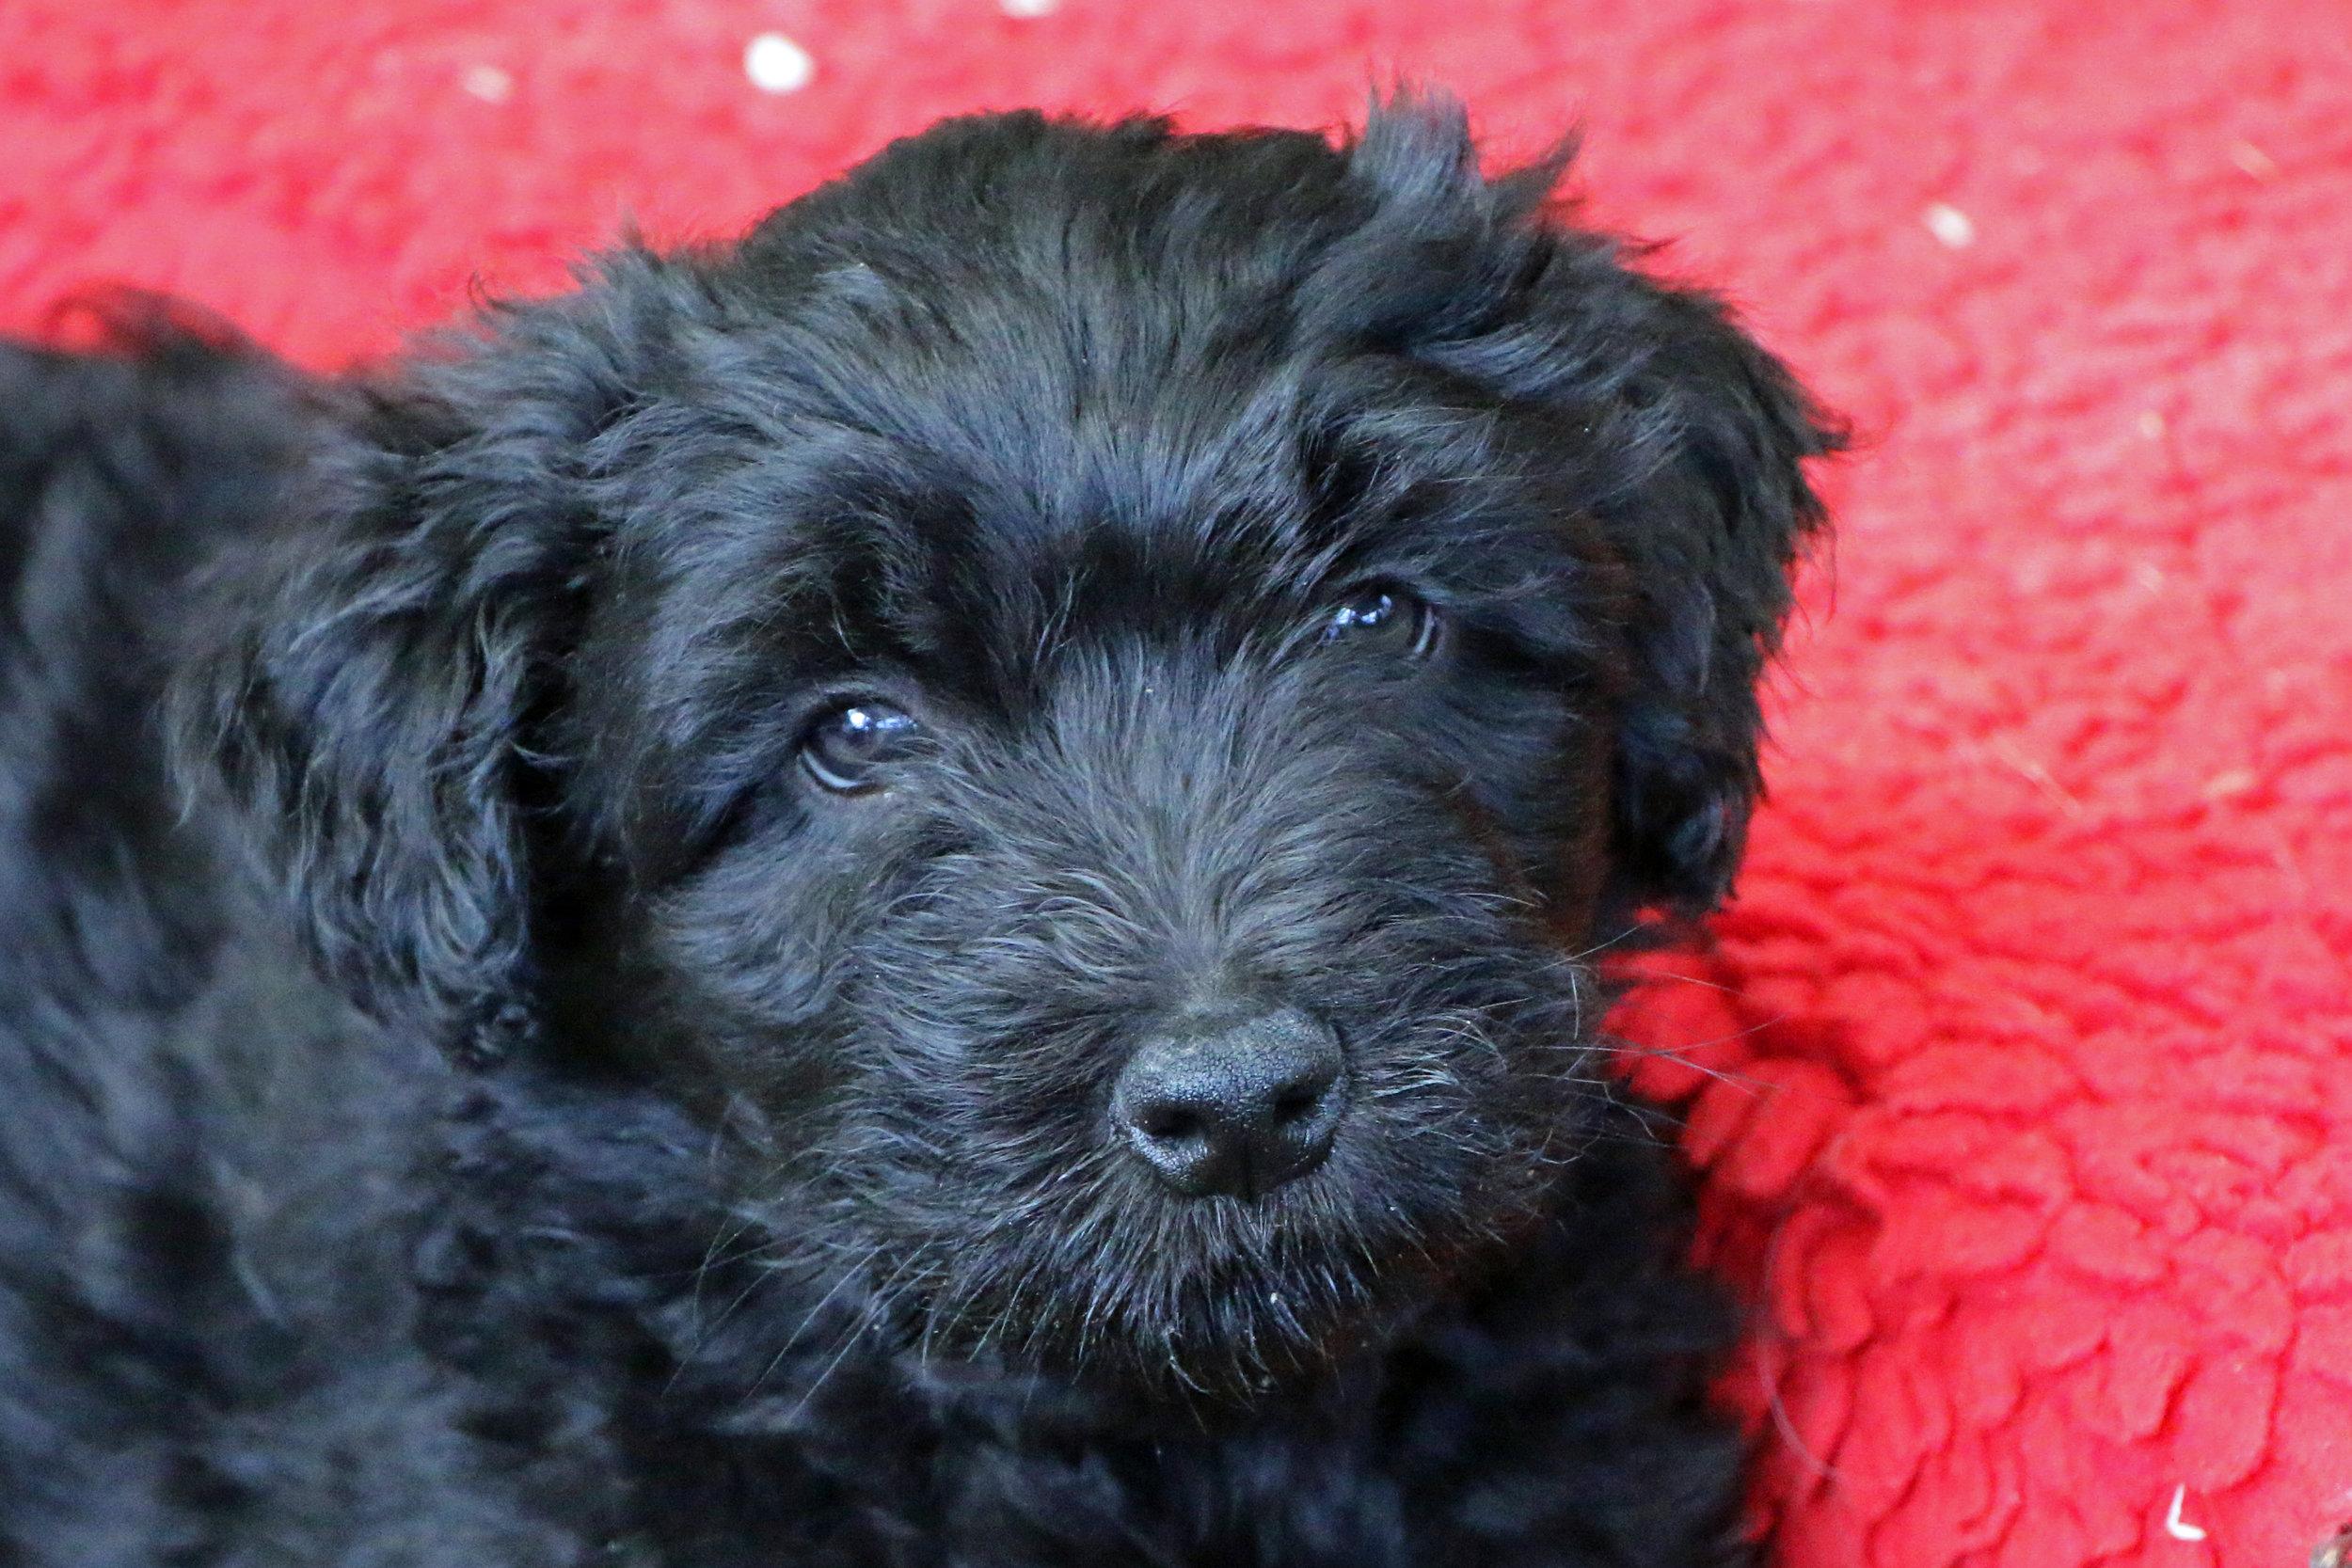 Puppy 7 weeks old